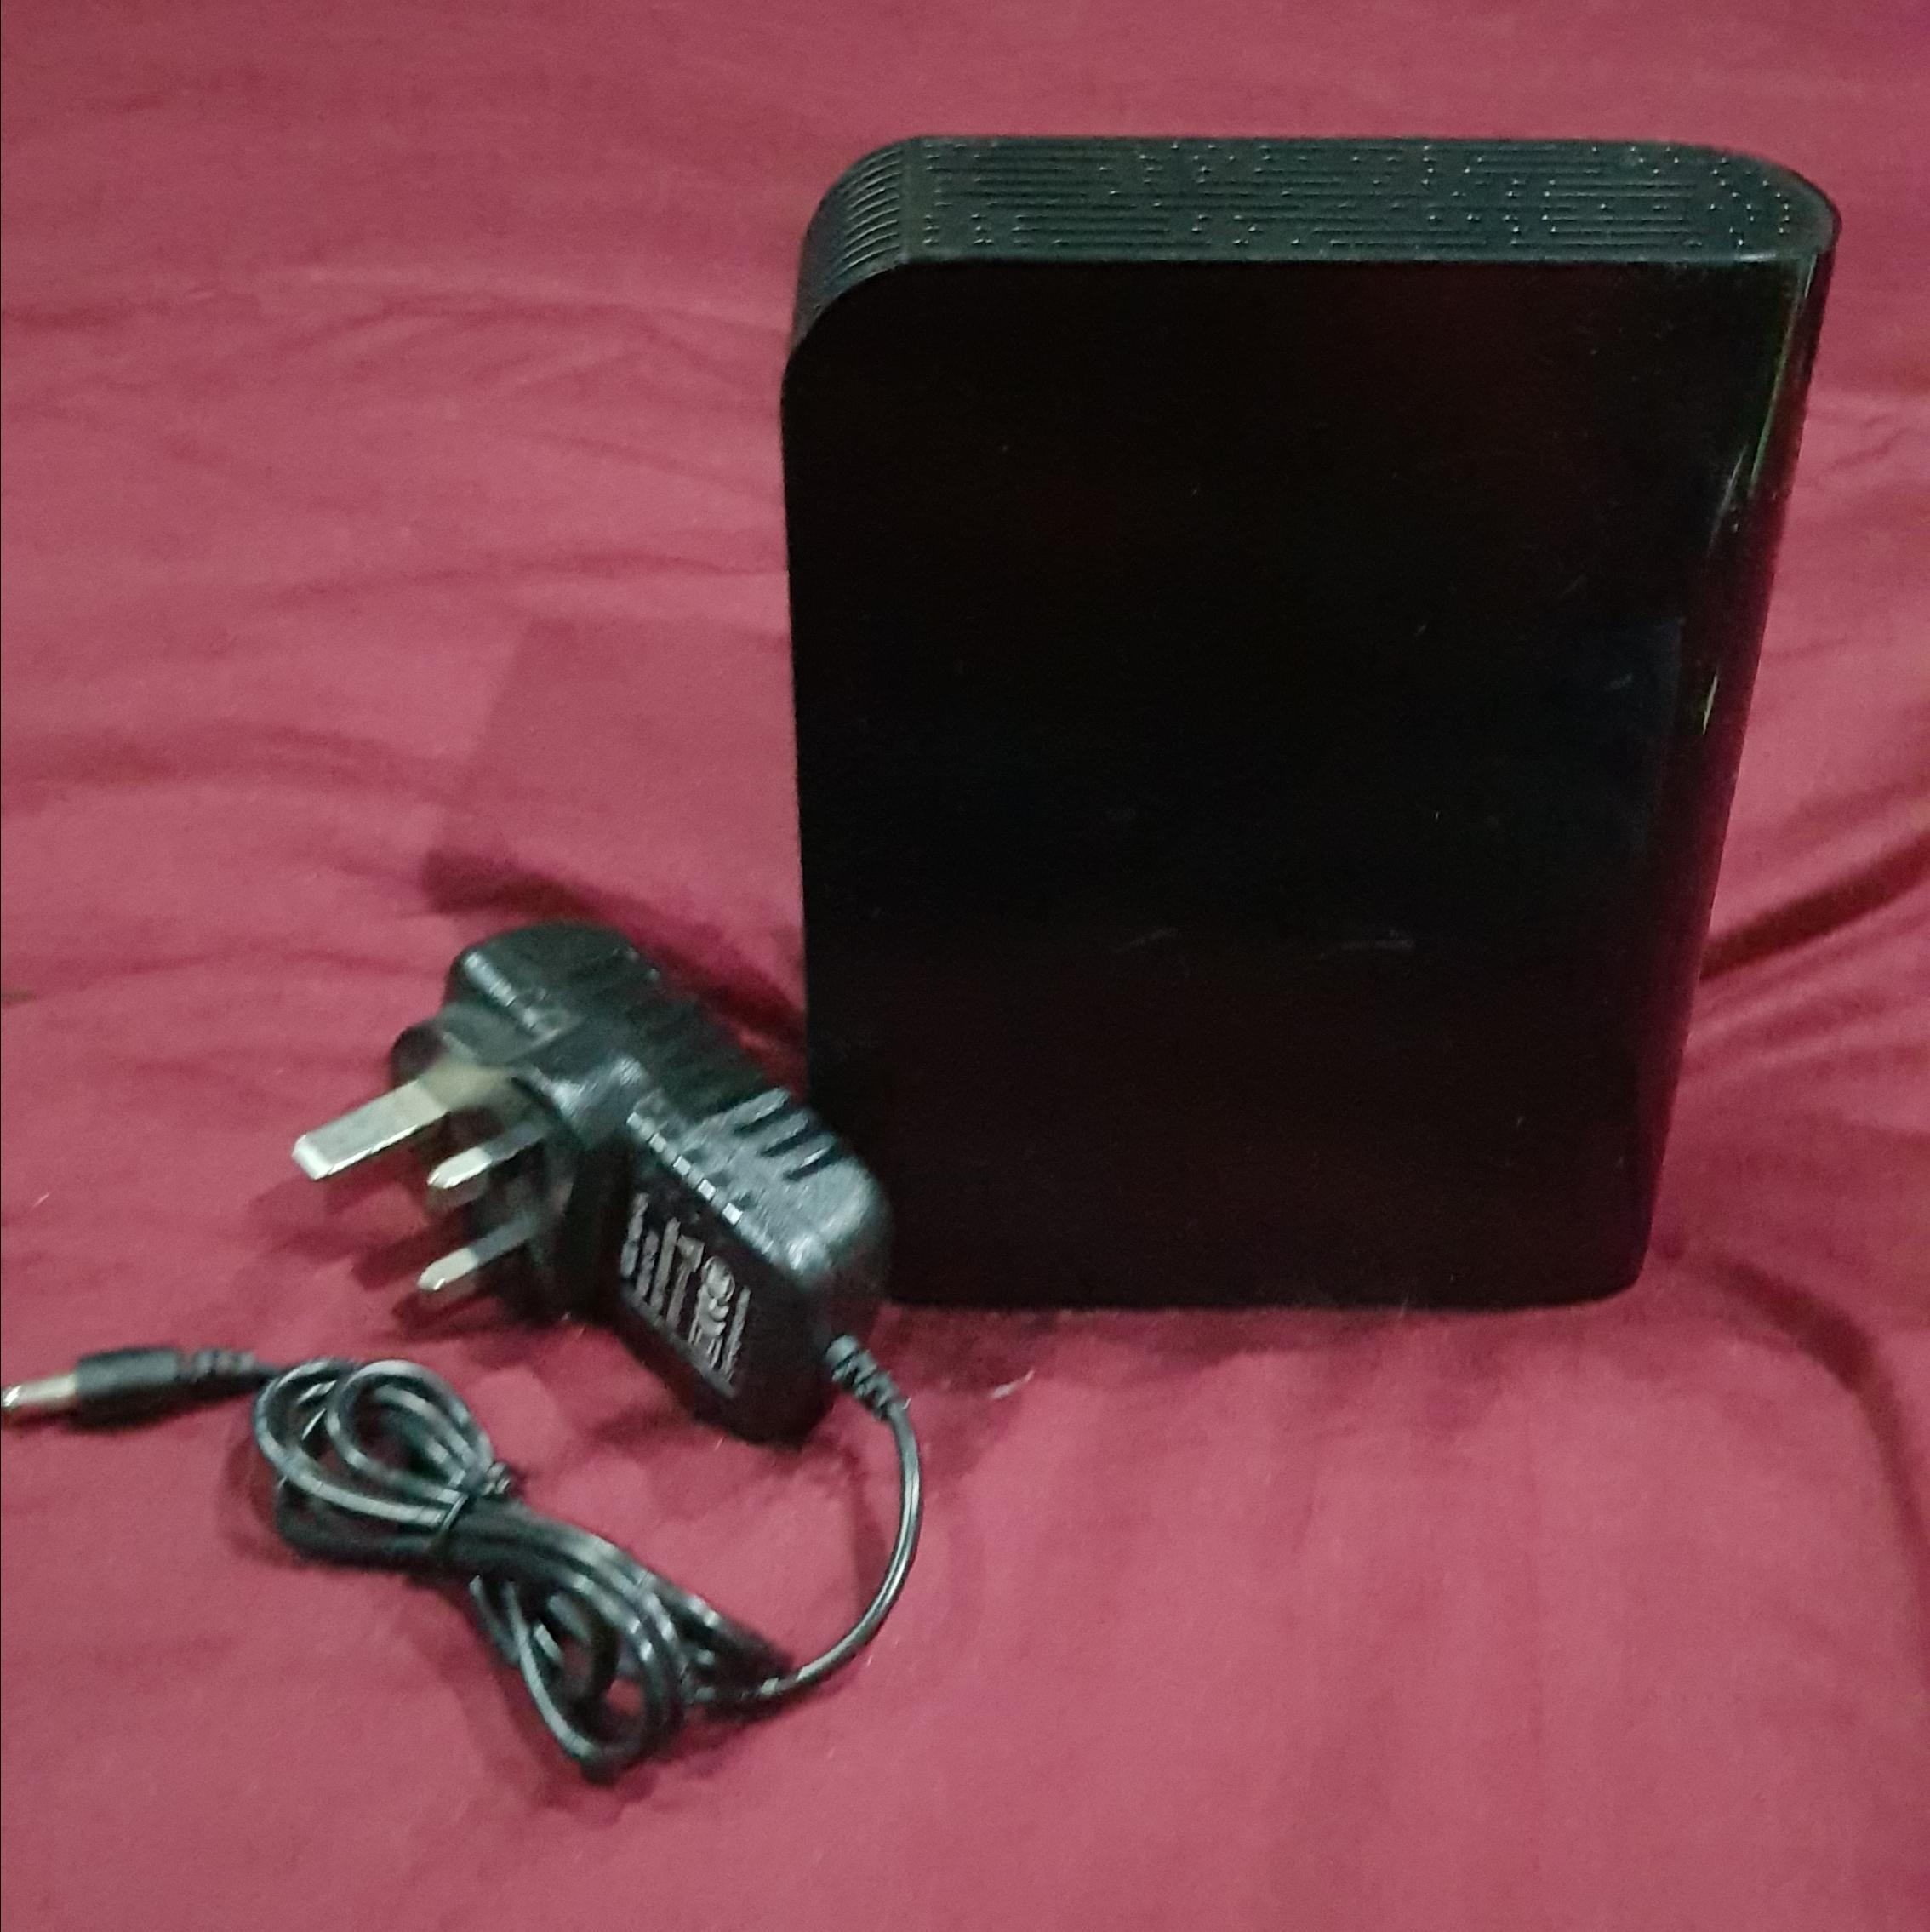 Western Digital WD My Book 1tb External Hard Drive HDD